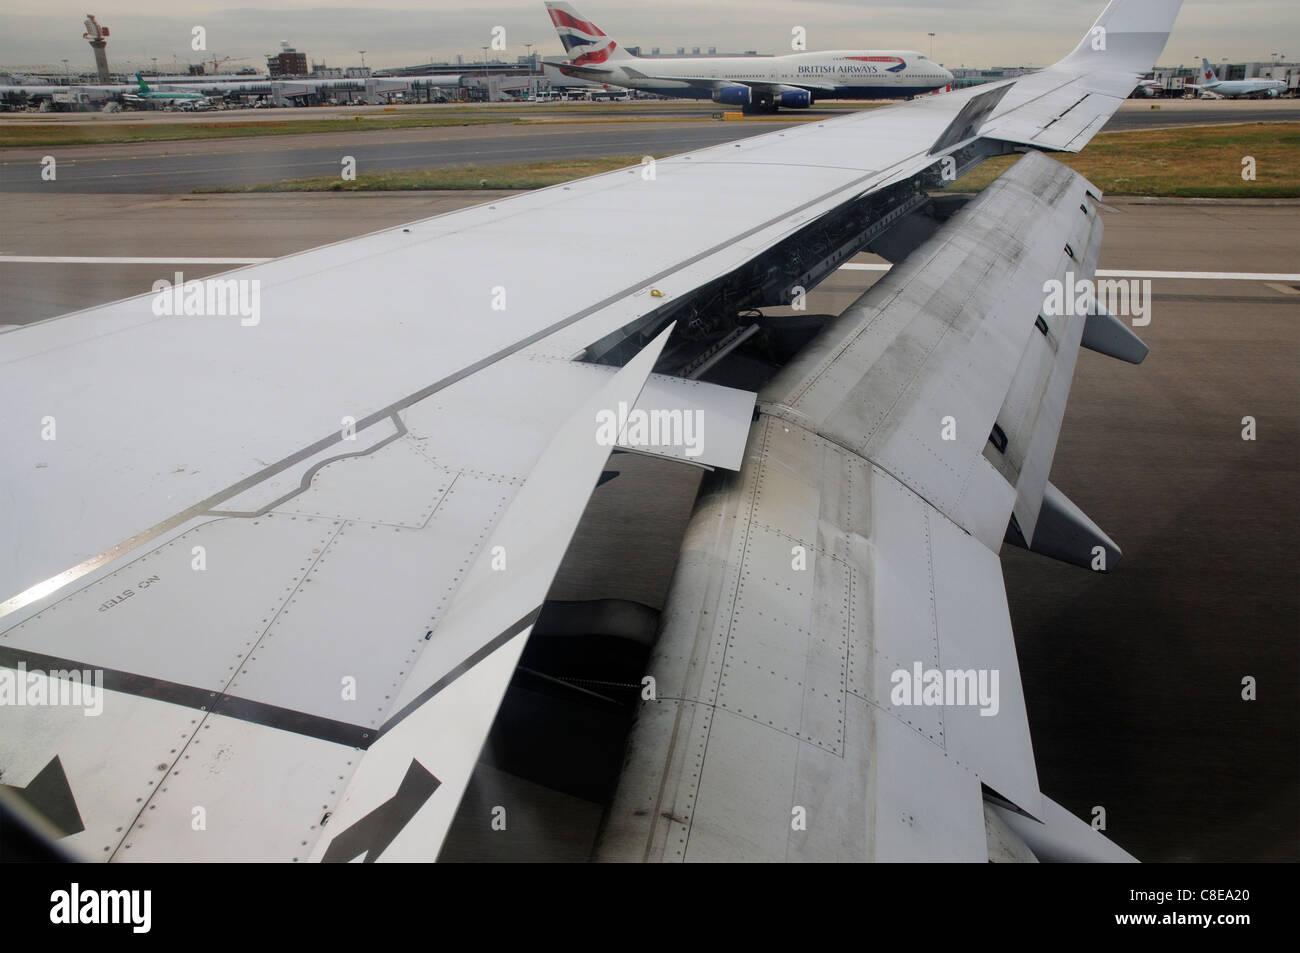 An  aeroplane wing configured for landing - Stock Image